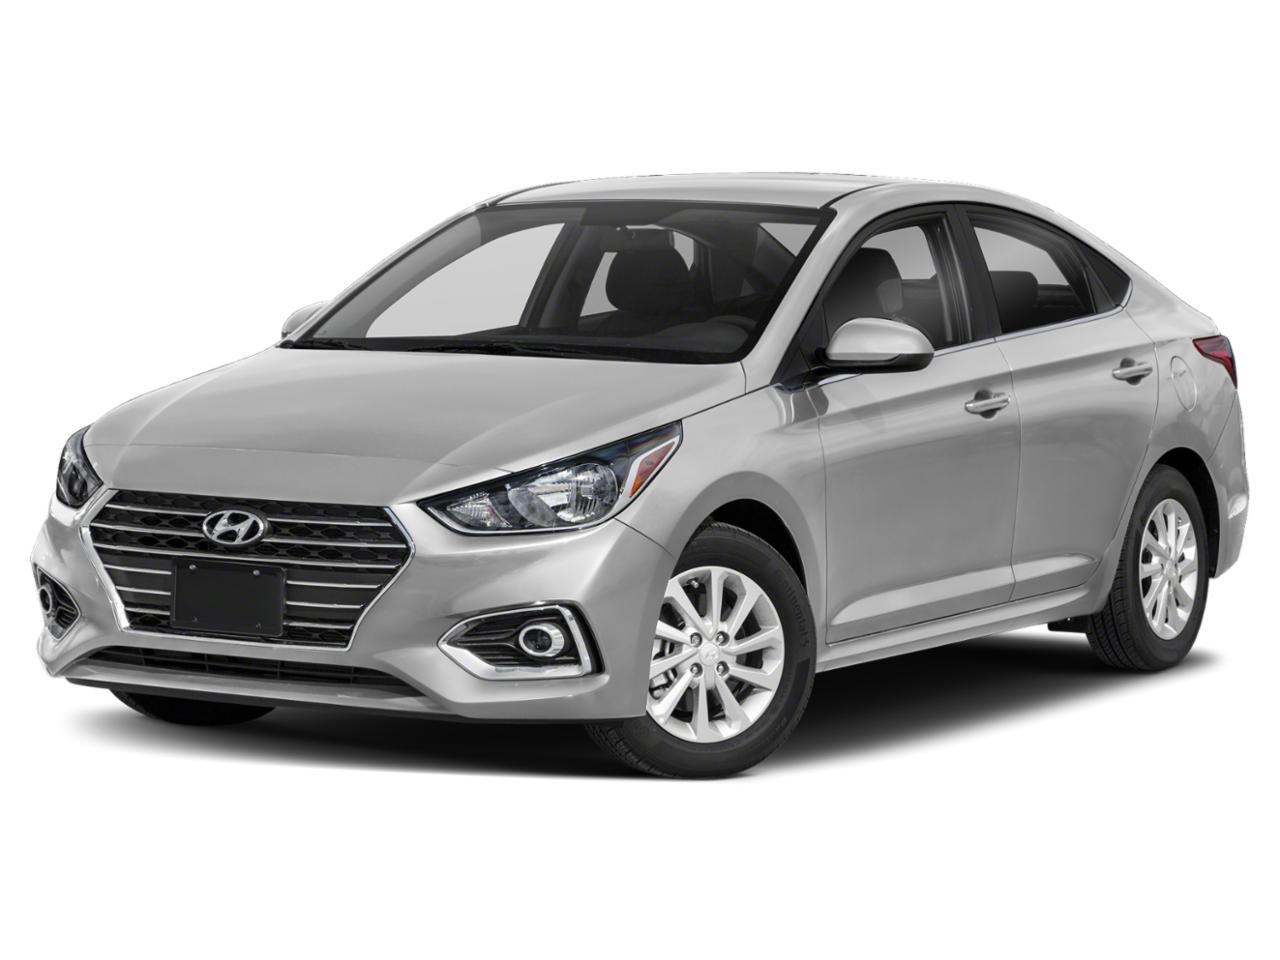 2020 Hyundai Accent Vehicle Photo in MADISON, WI 53713-3220